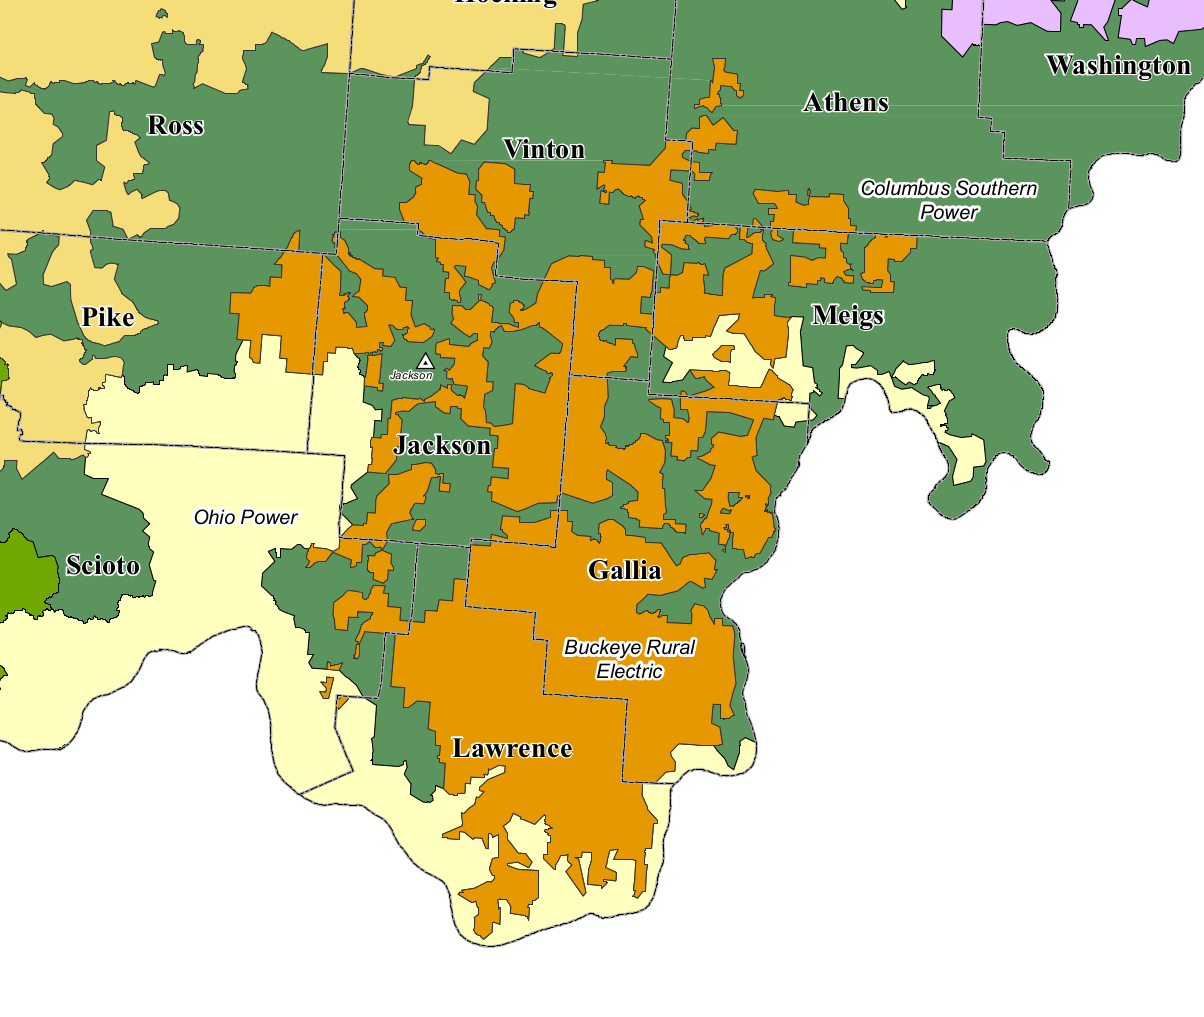 BREC Territory Map  Buckeye Rural Electric